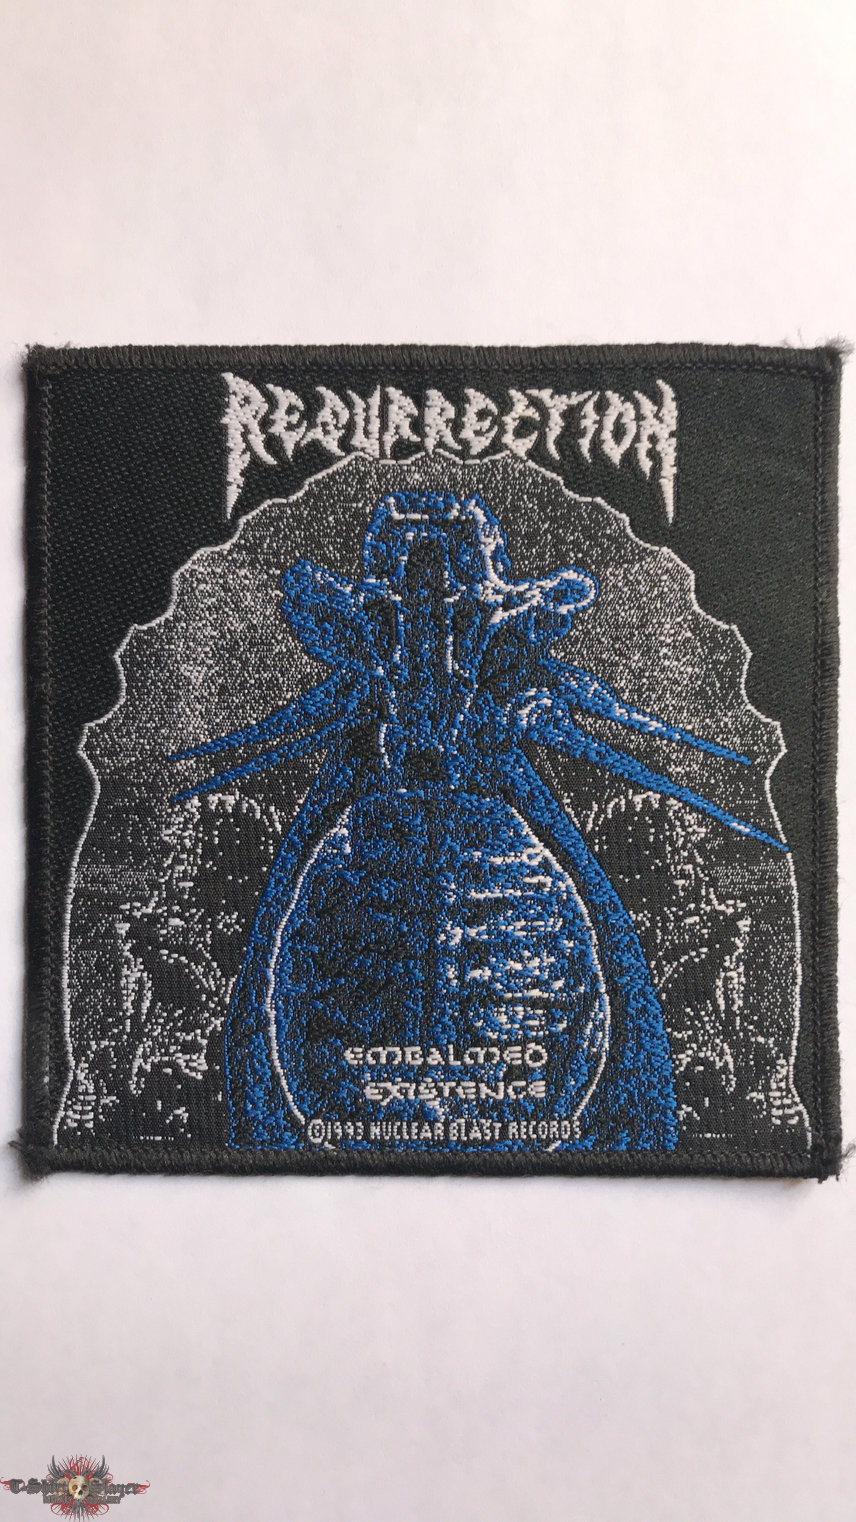 Resurrection: Embalmed Existence